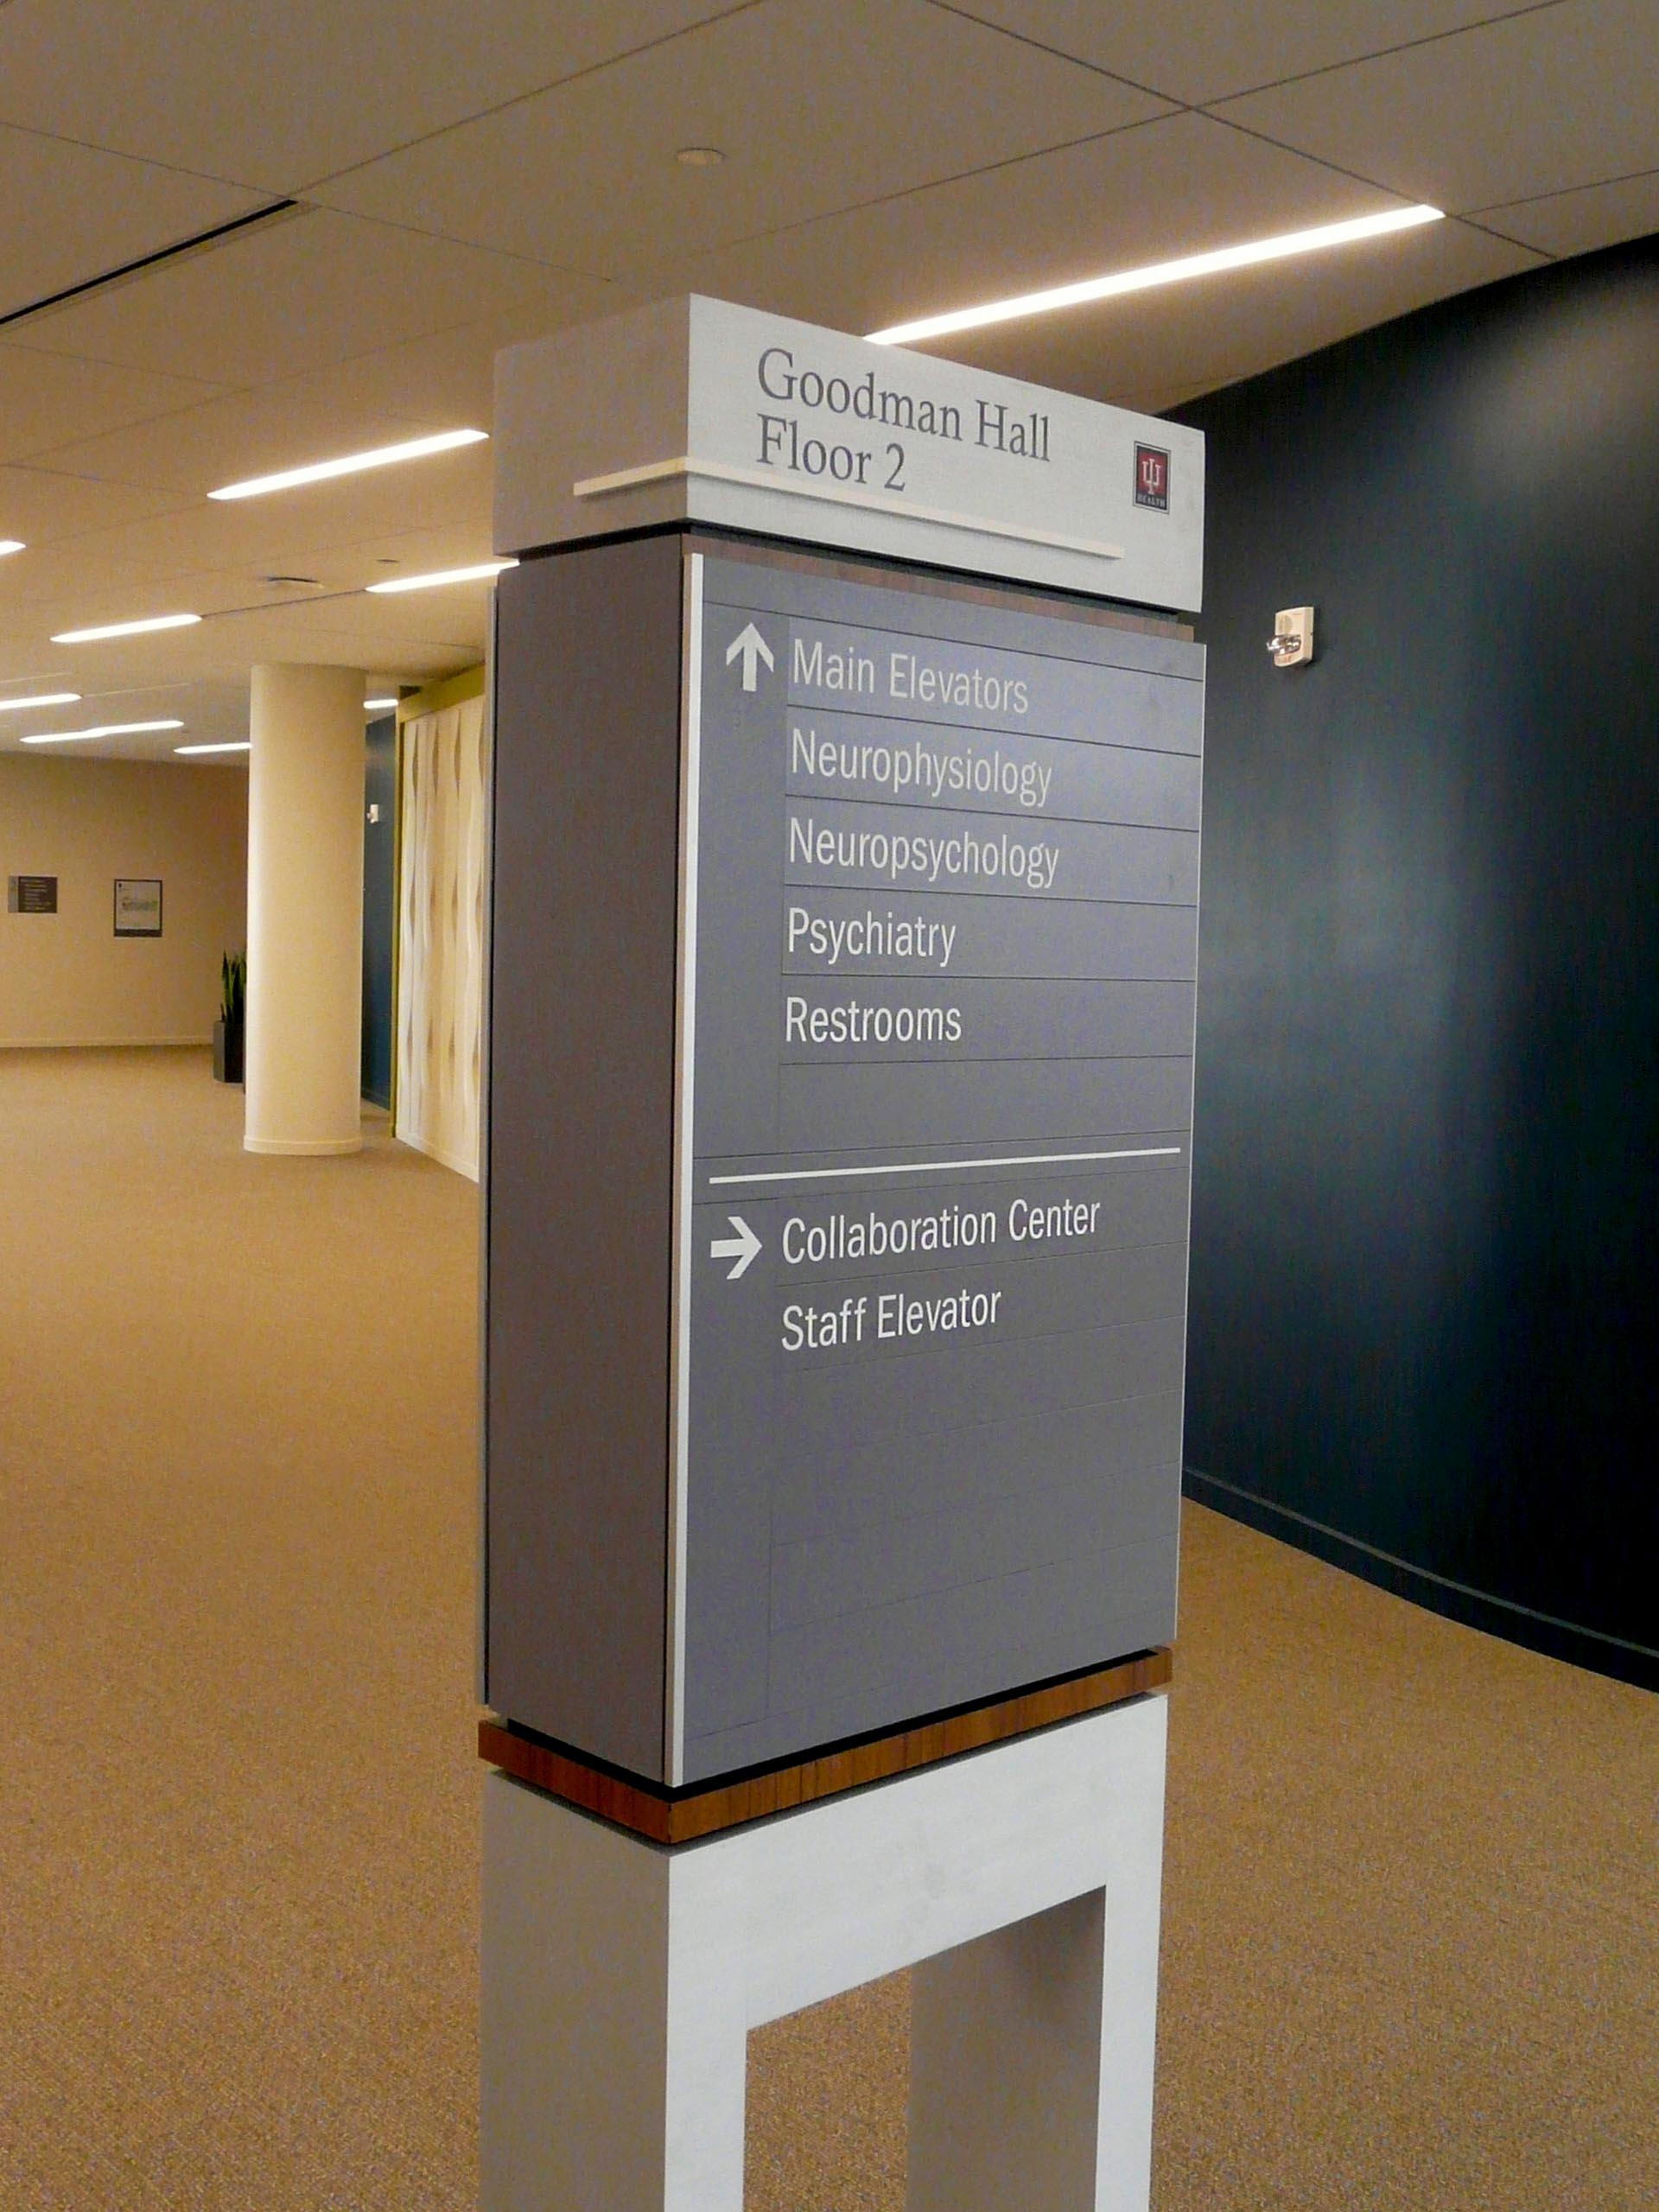 wayfinding directional hospital signage.jpg